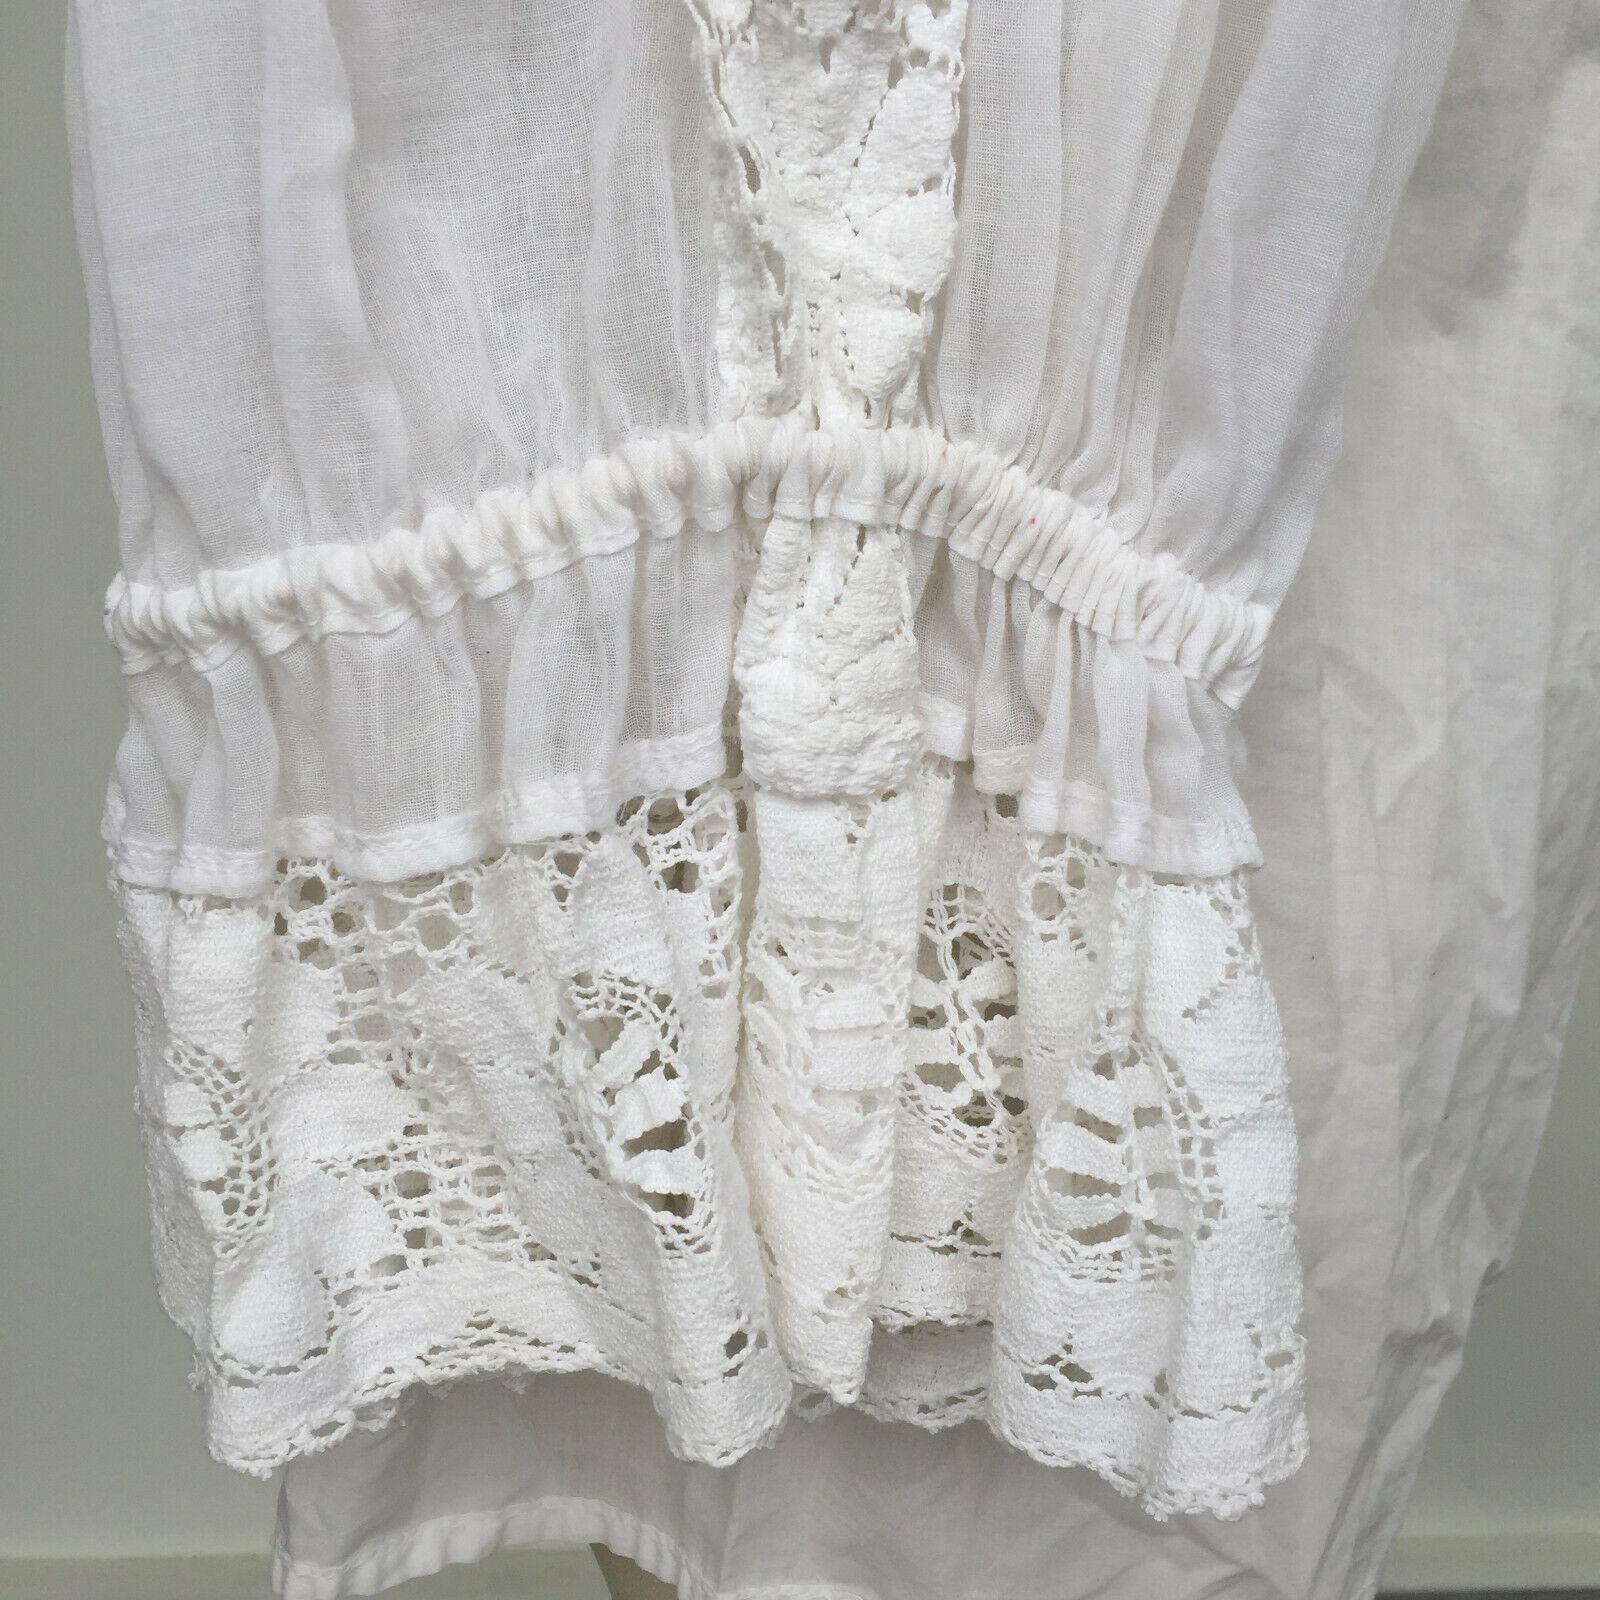 VTG 1970s Hungarian Handmade Textured Boho-Chic P… - image 7